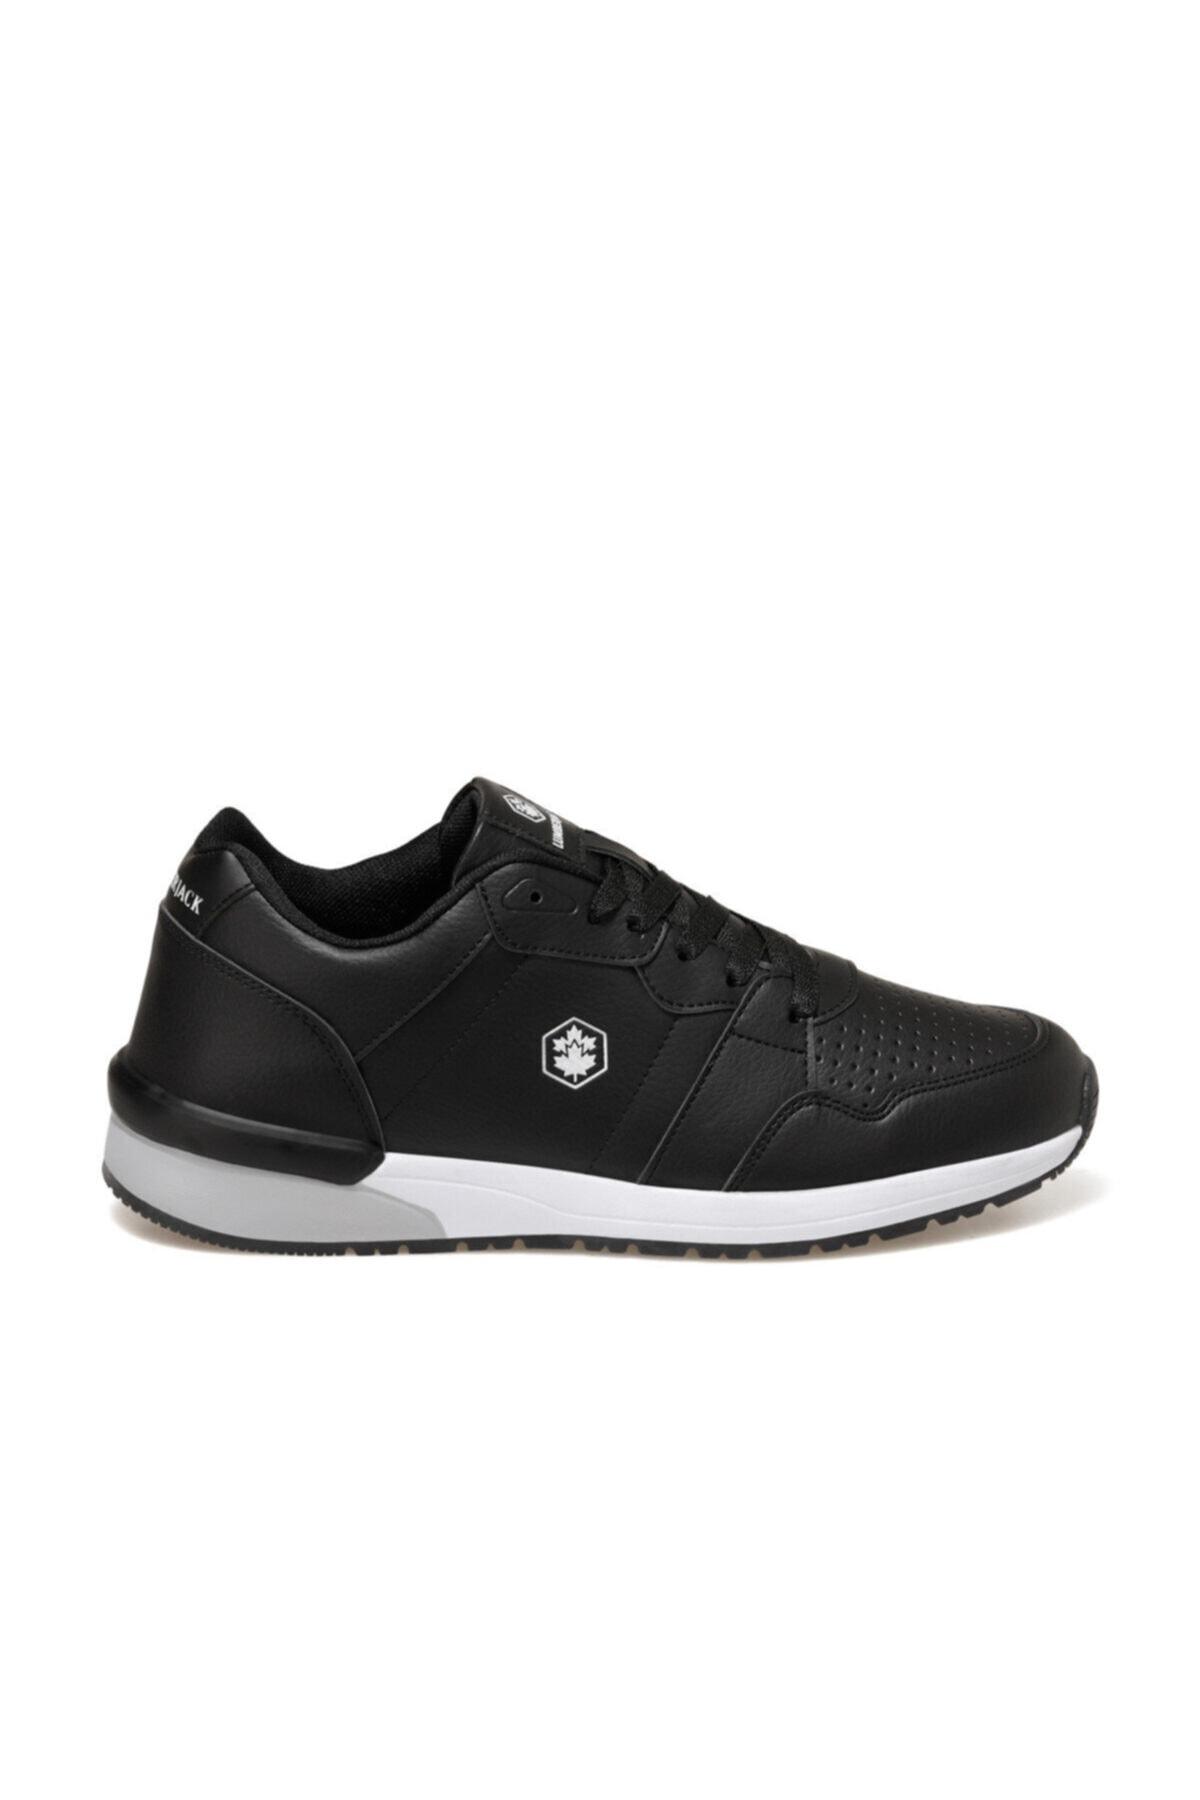 lumberjack MYKONOS Siyah Erkek Sneaker Ayakkabı 100557575 2